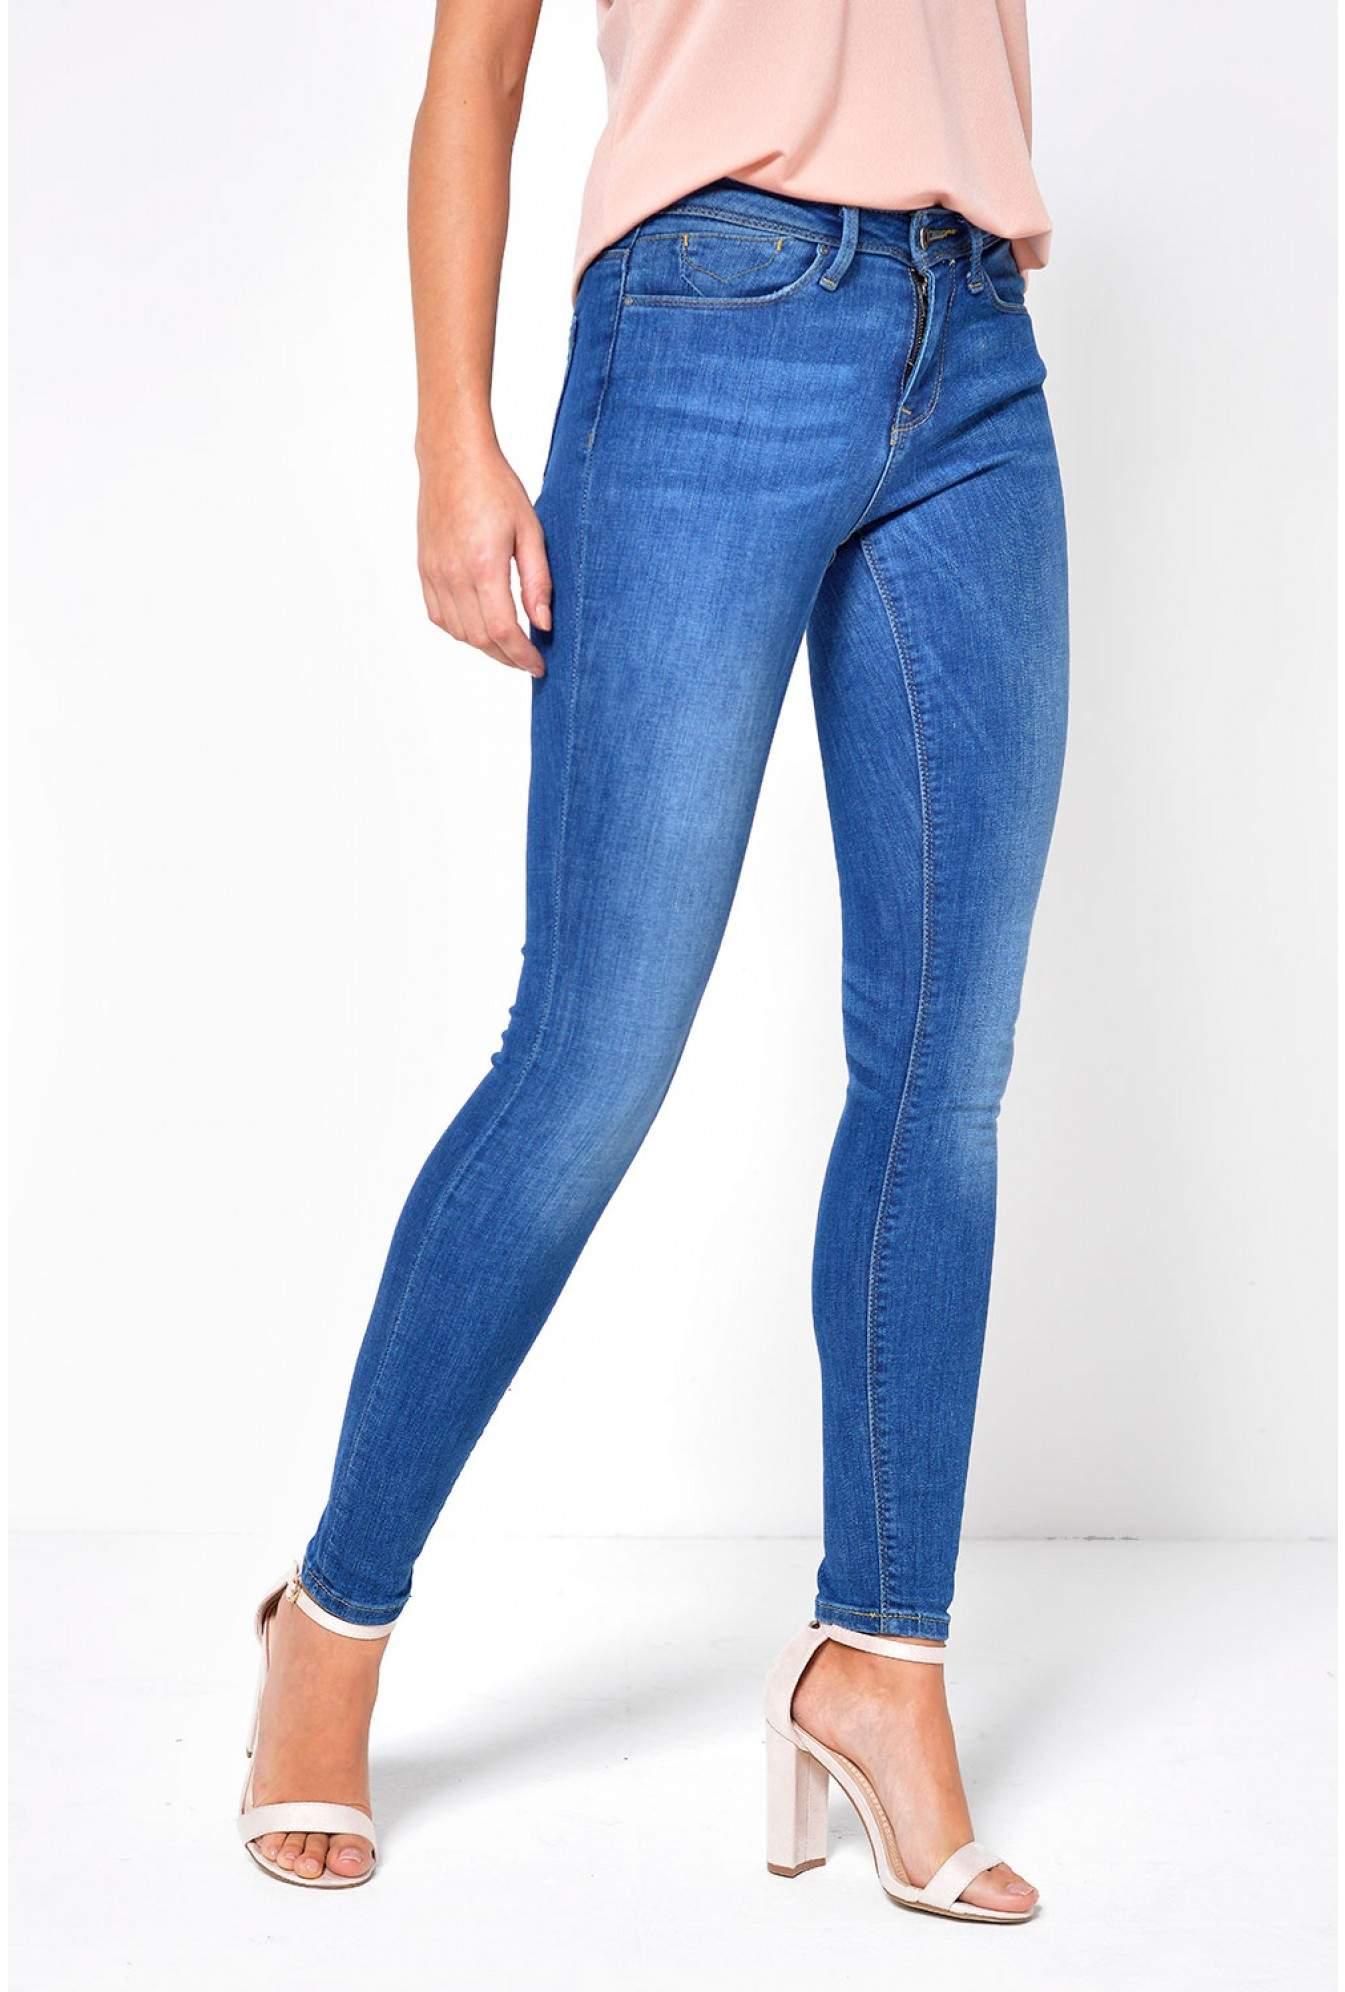 6aa9a9884ea Only Carmen Short Skinny Fit Jeans in Medium Blue Denim